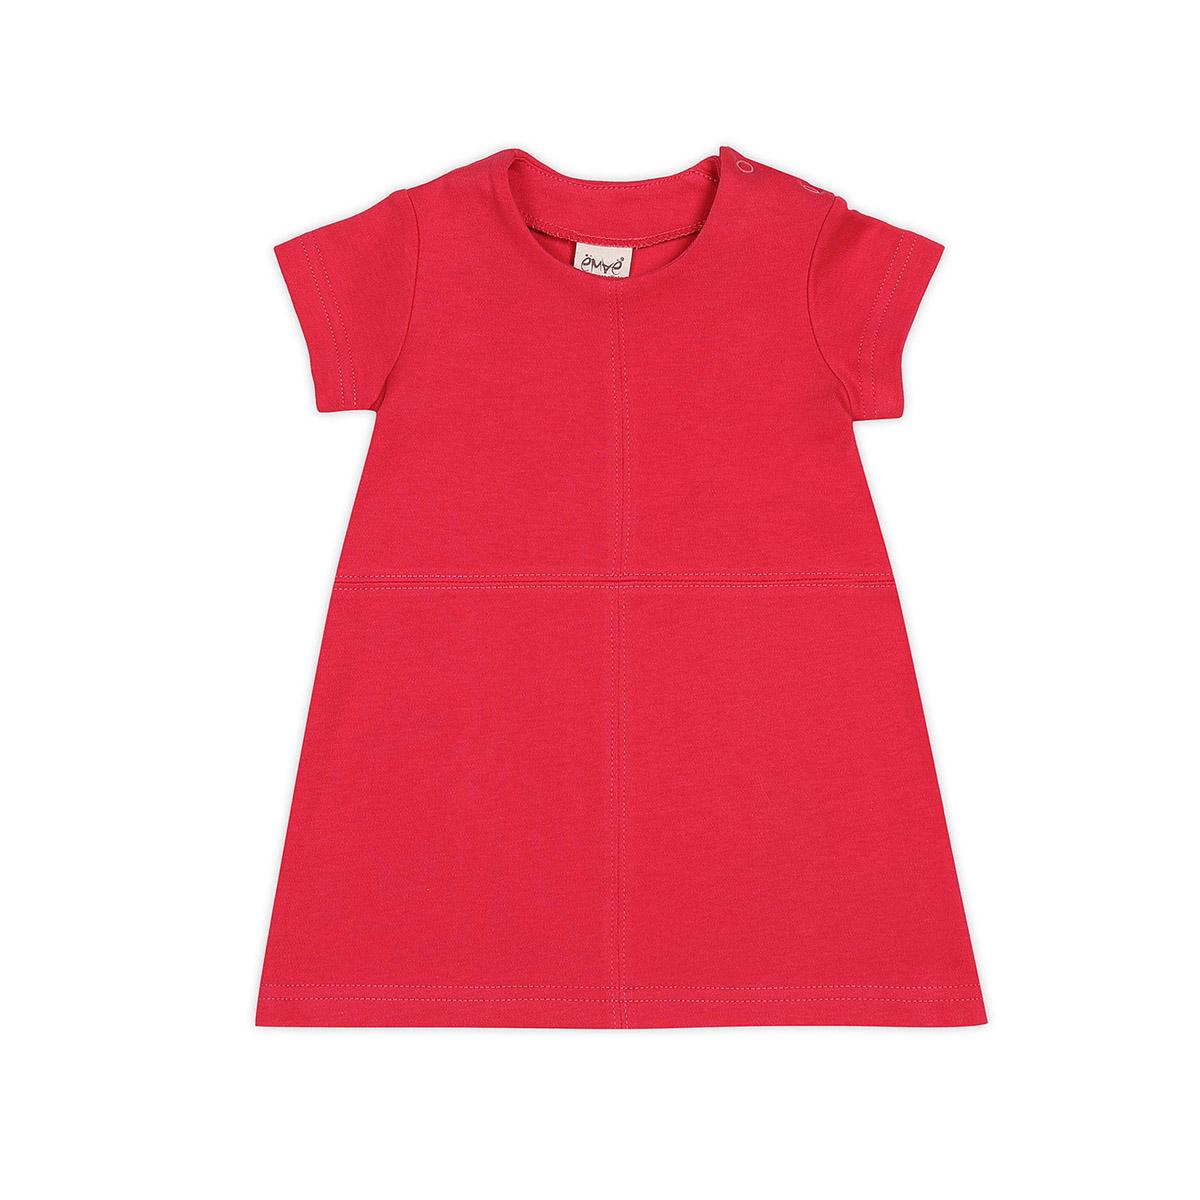 Платье Ёмаё Бабочки (12-201) рост 62 коралл<br>